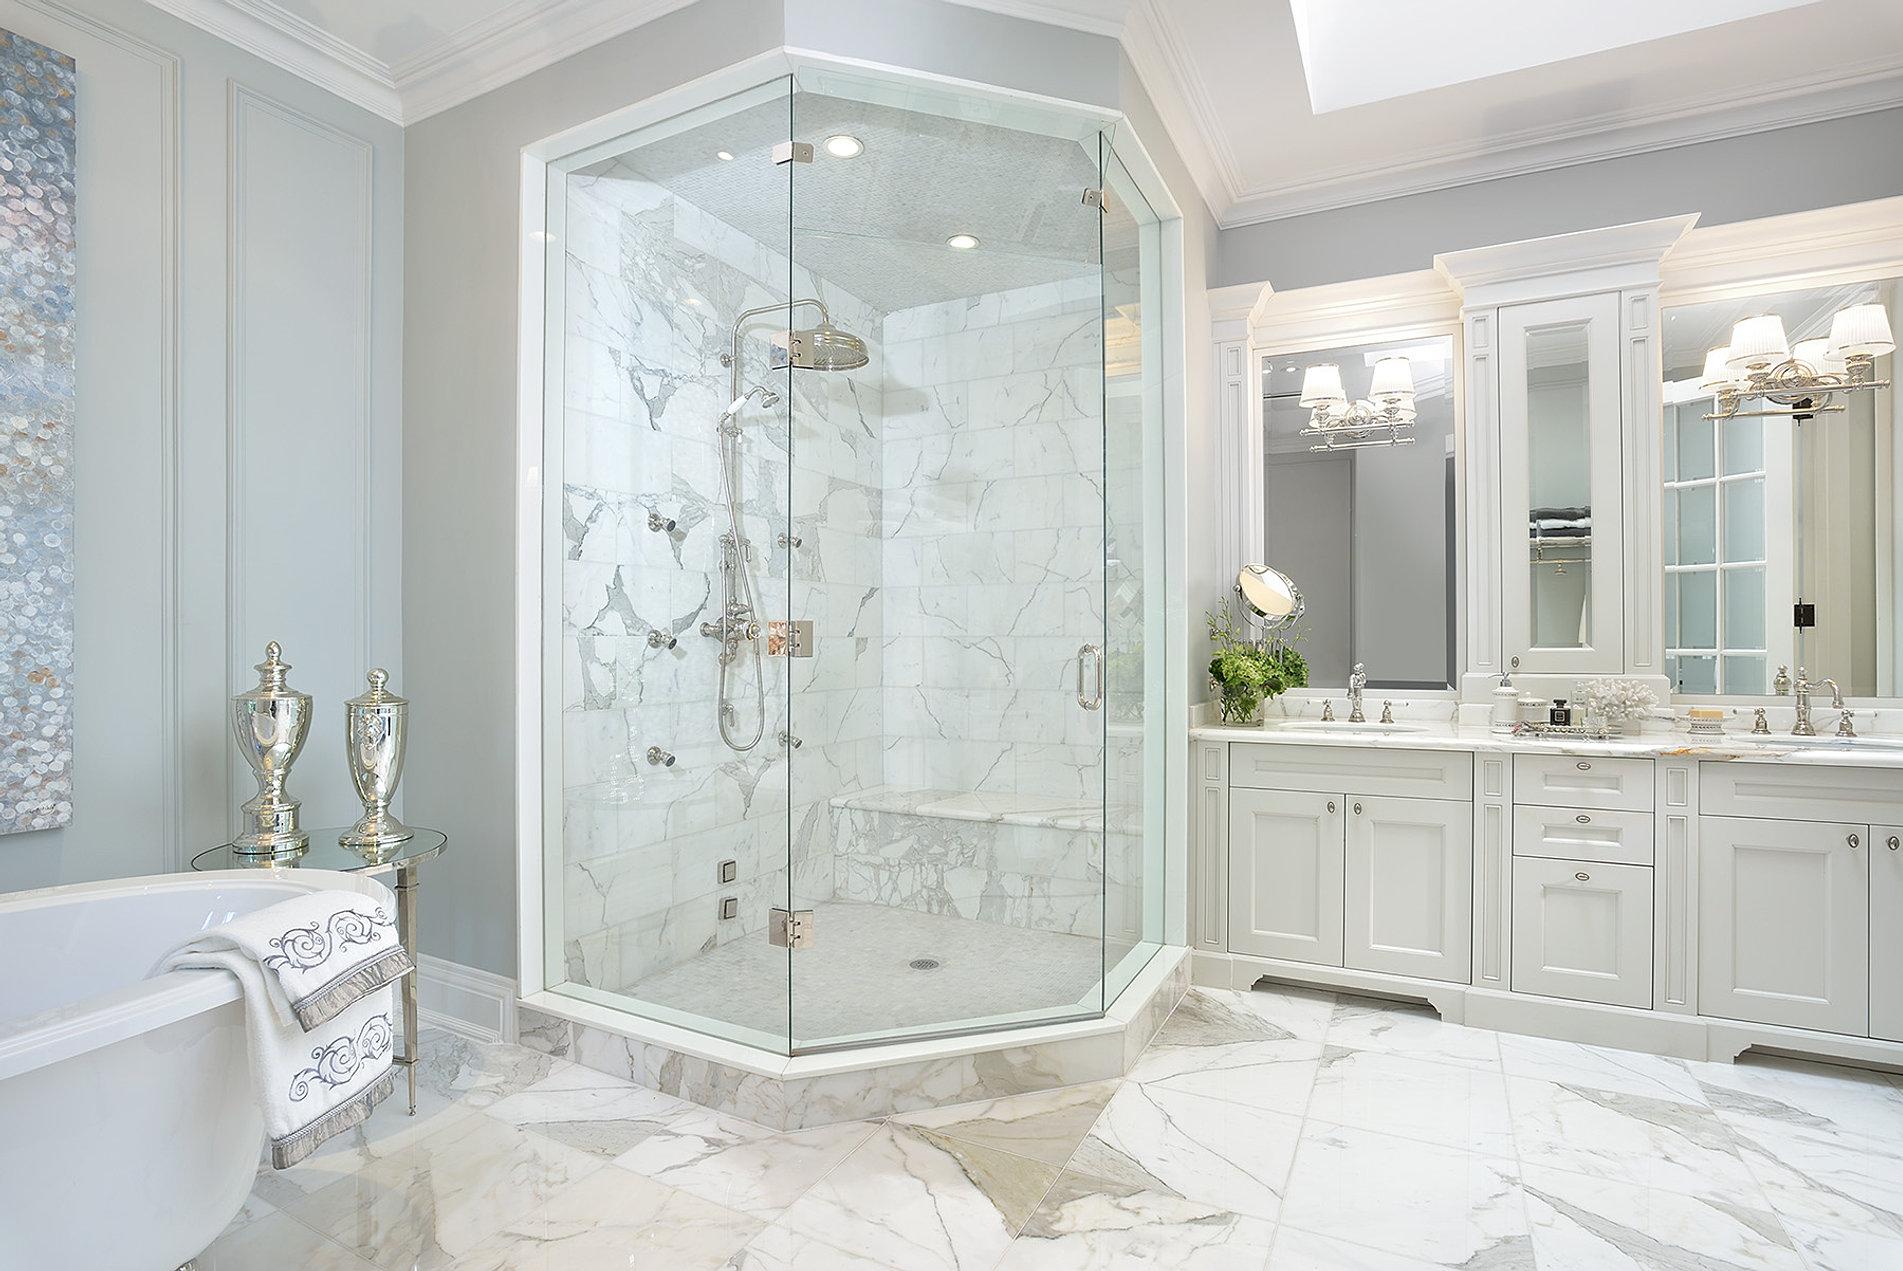 arnalphotography   Bathrooms